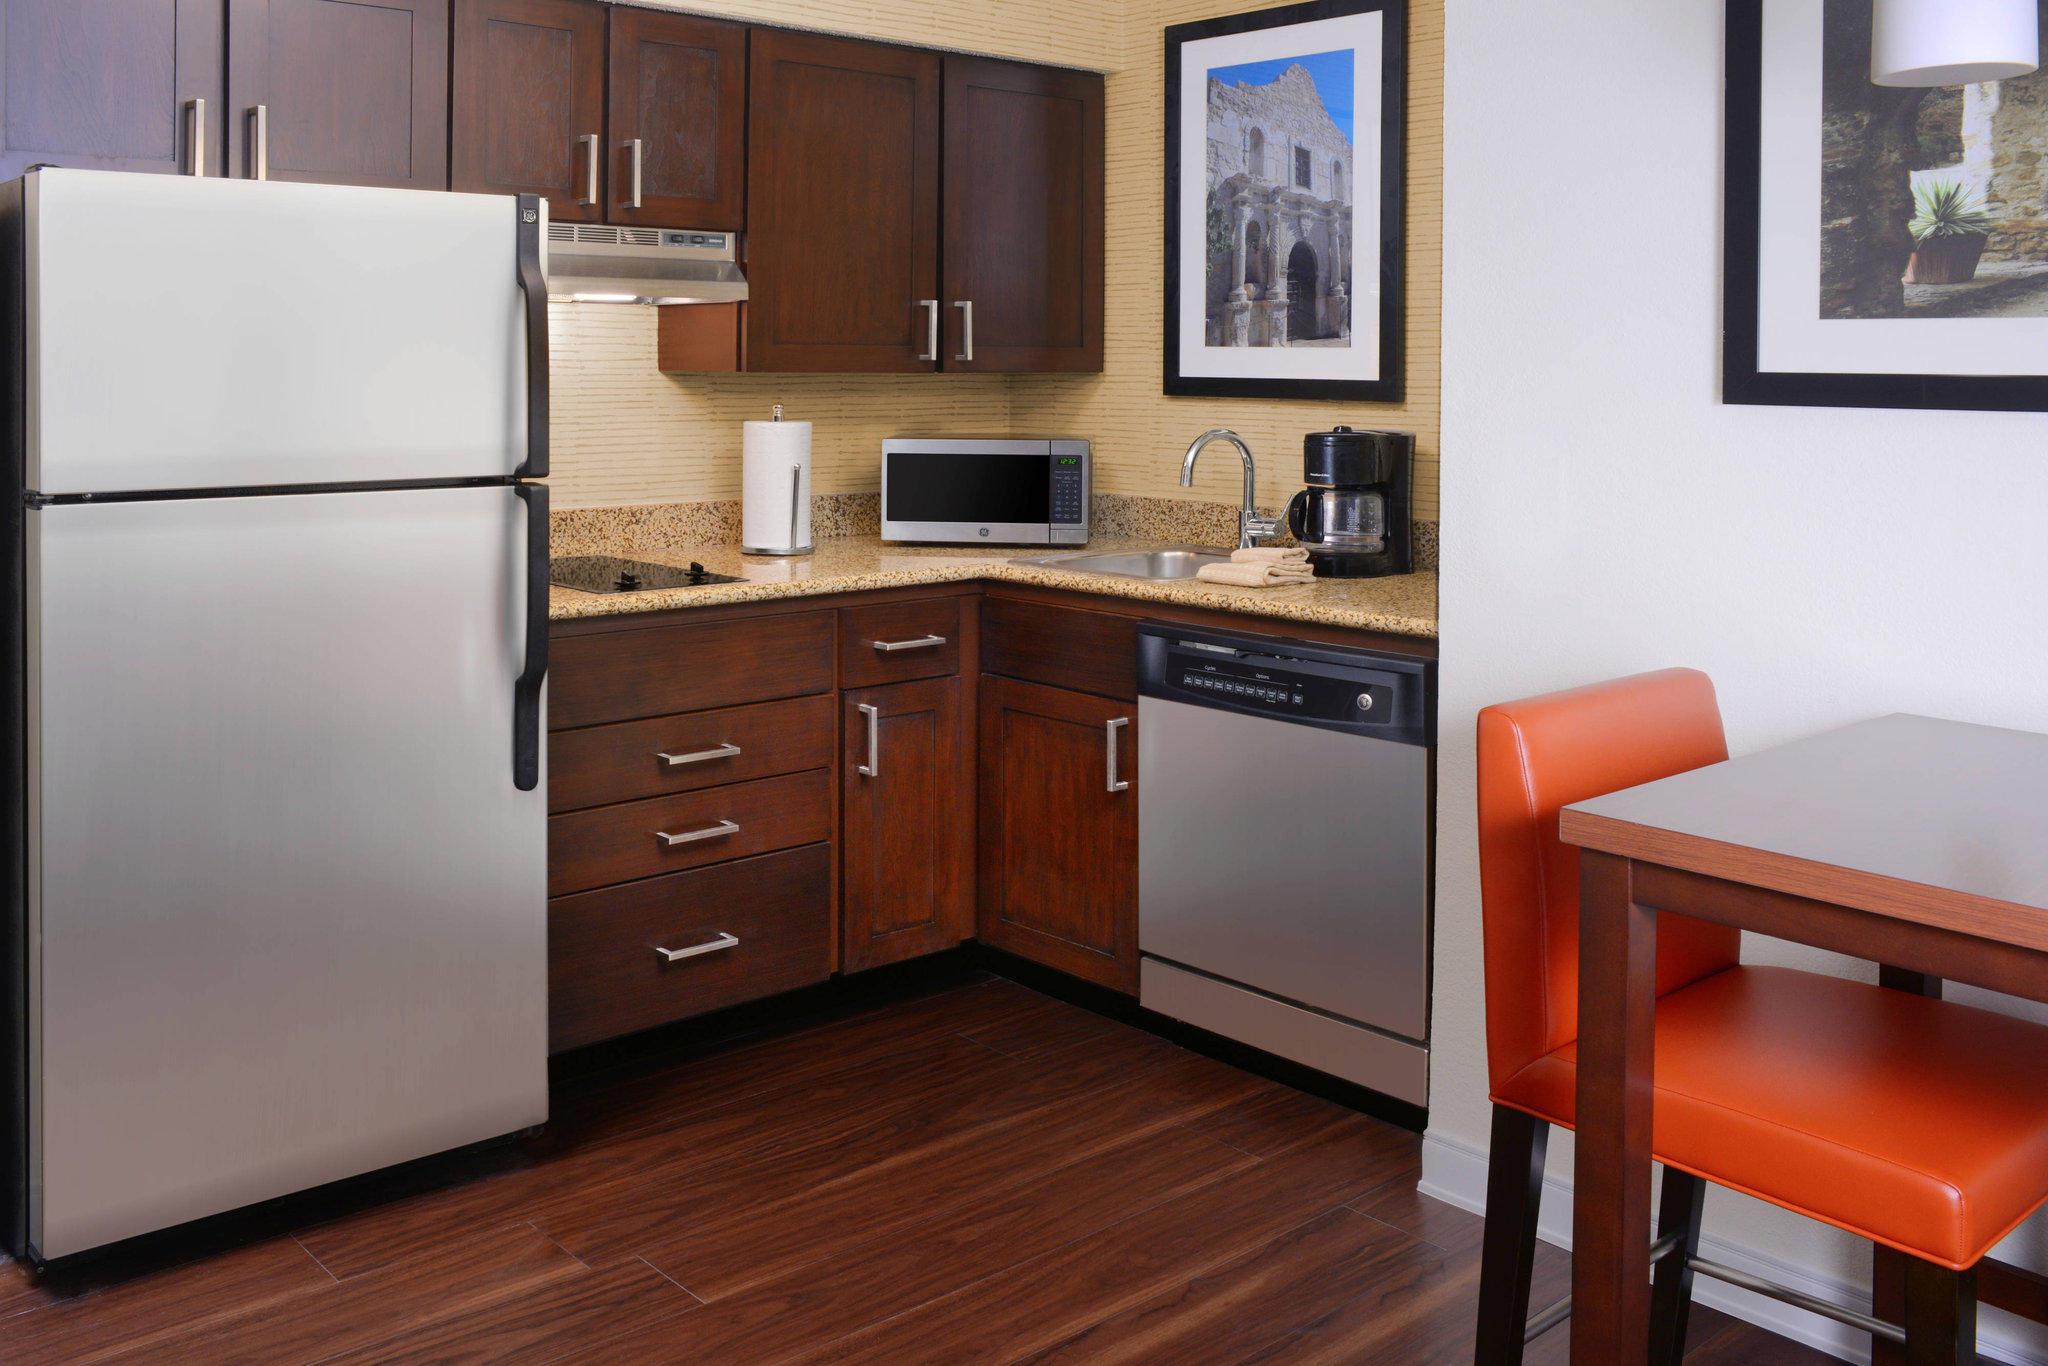 Residence Inn by Marriott San Antonio Airport/Alamo Heights